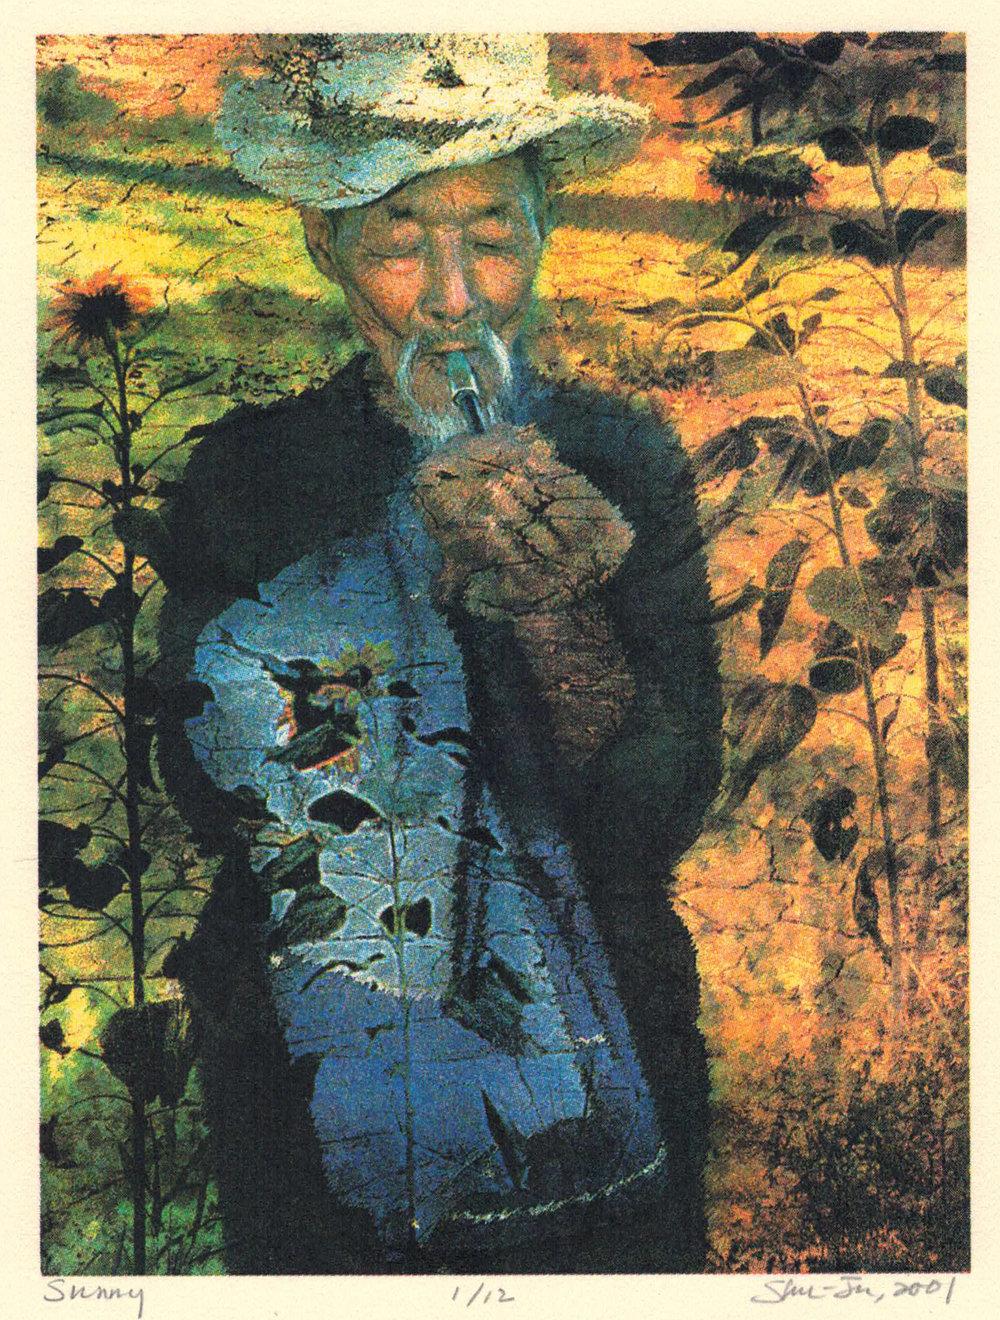 ● Sunny, Silk Road Portfolio